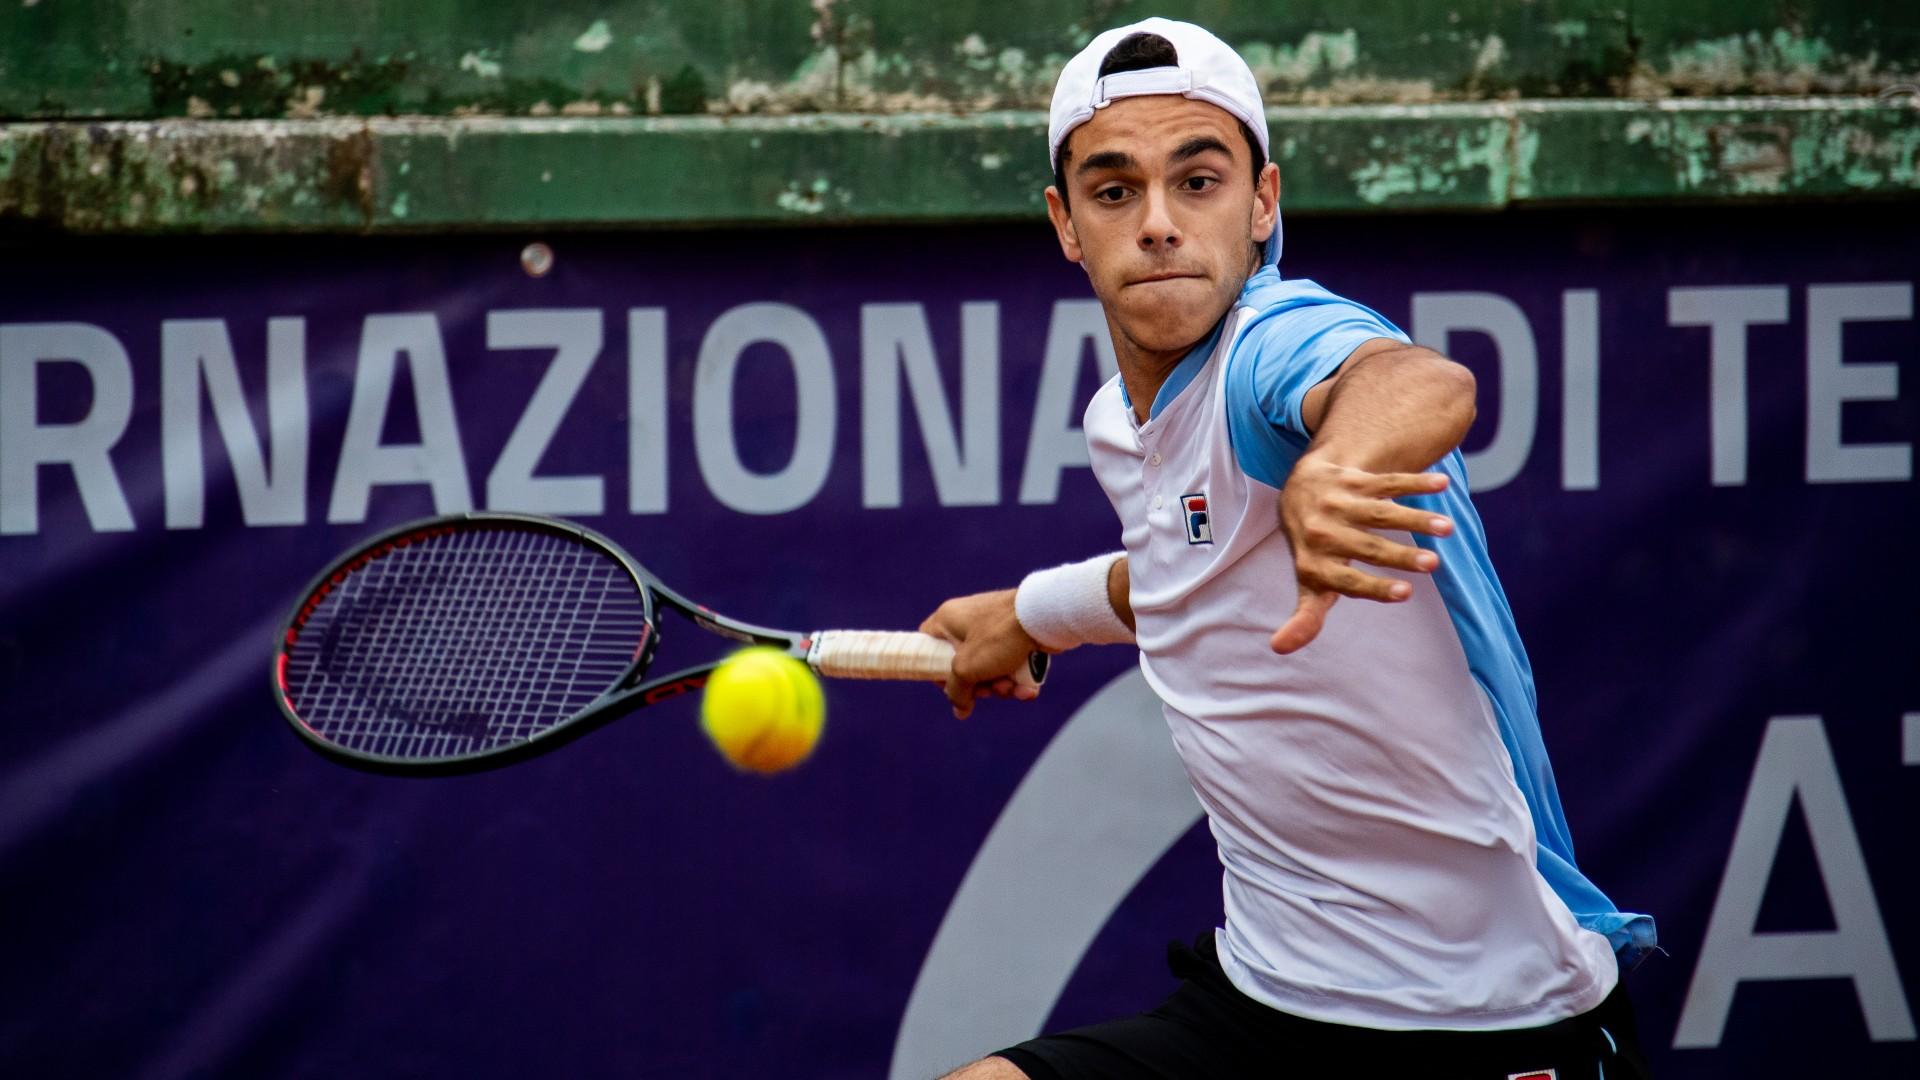 Juan Manuel Cerundolo reigned supreme in a memorable ATP Tour debut.